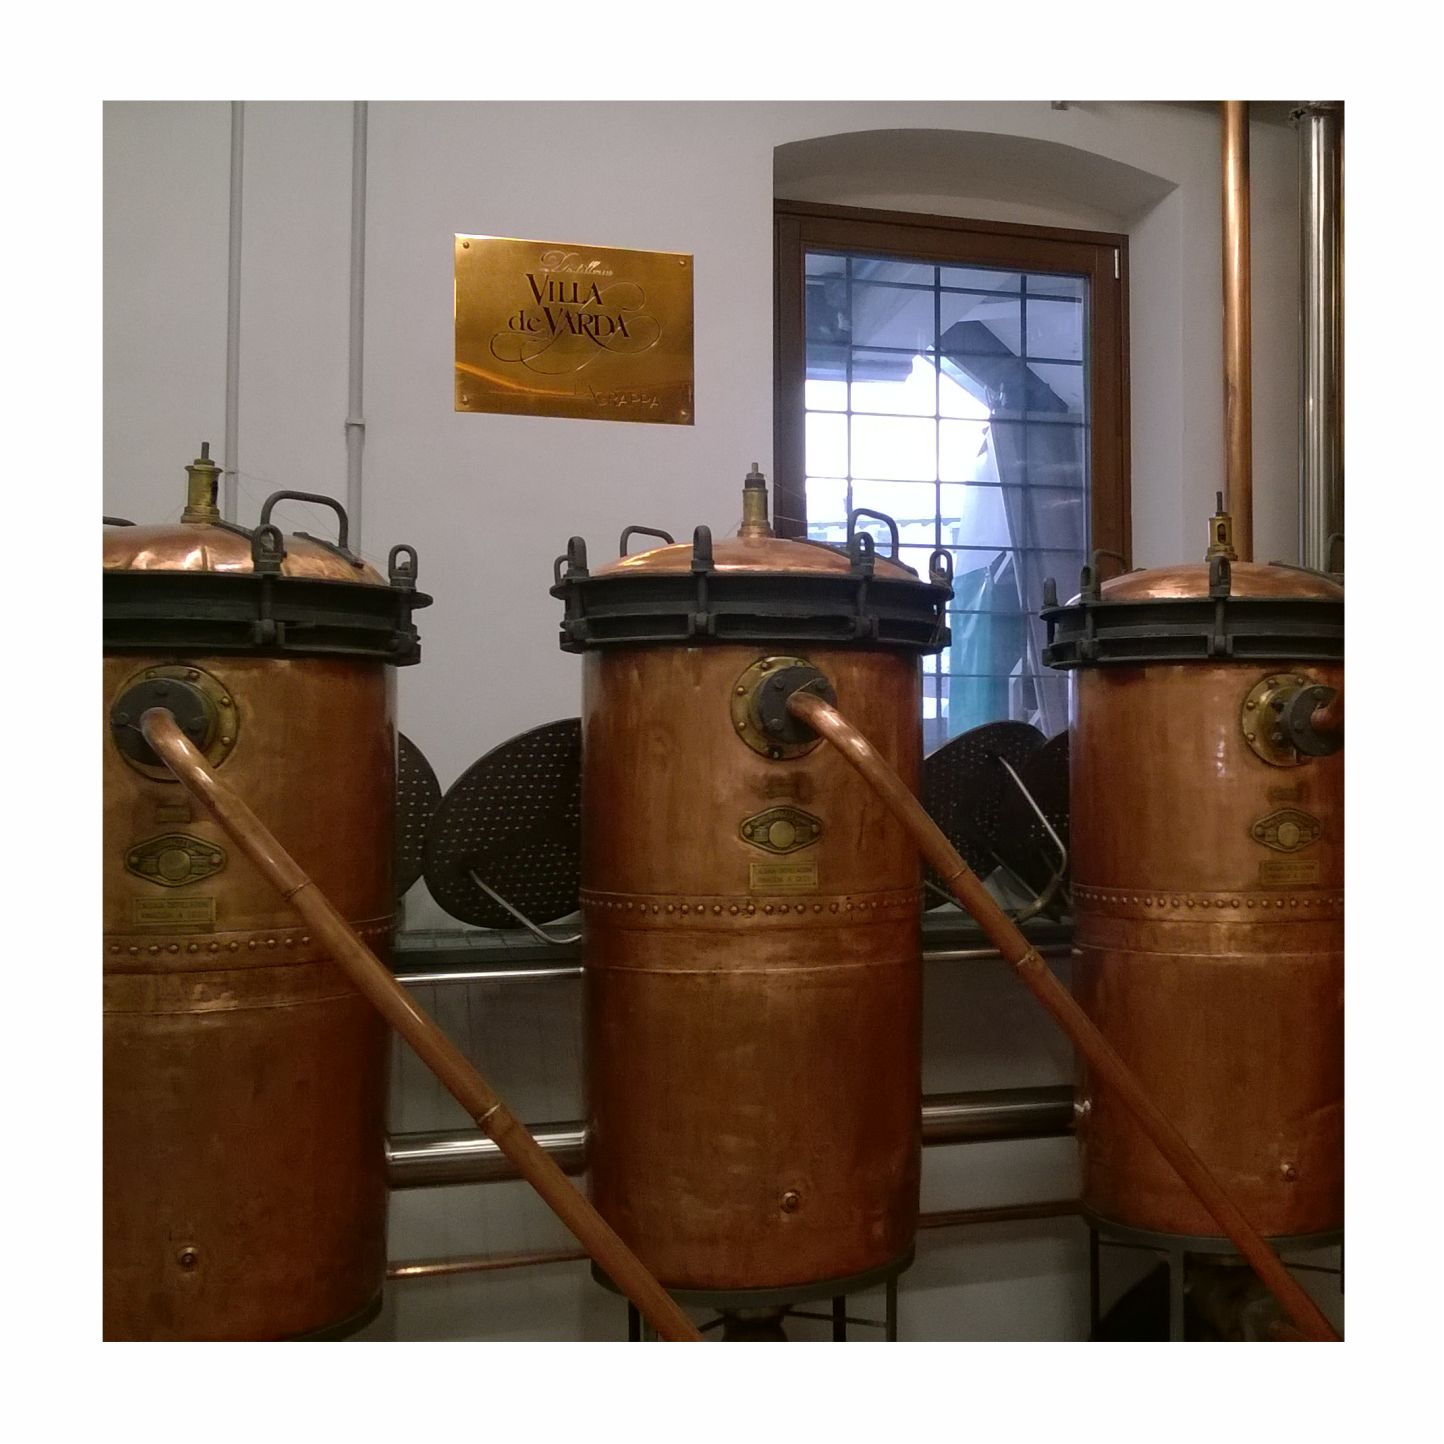 Targa in rame per la distilleria Villa de Varda